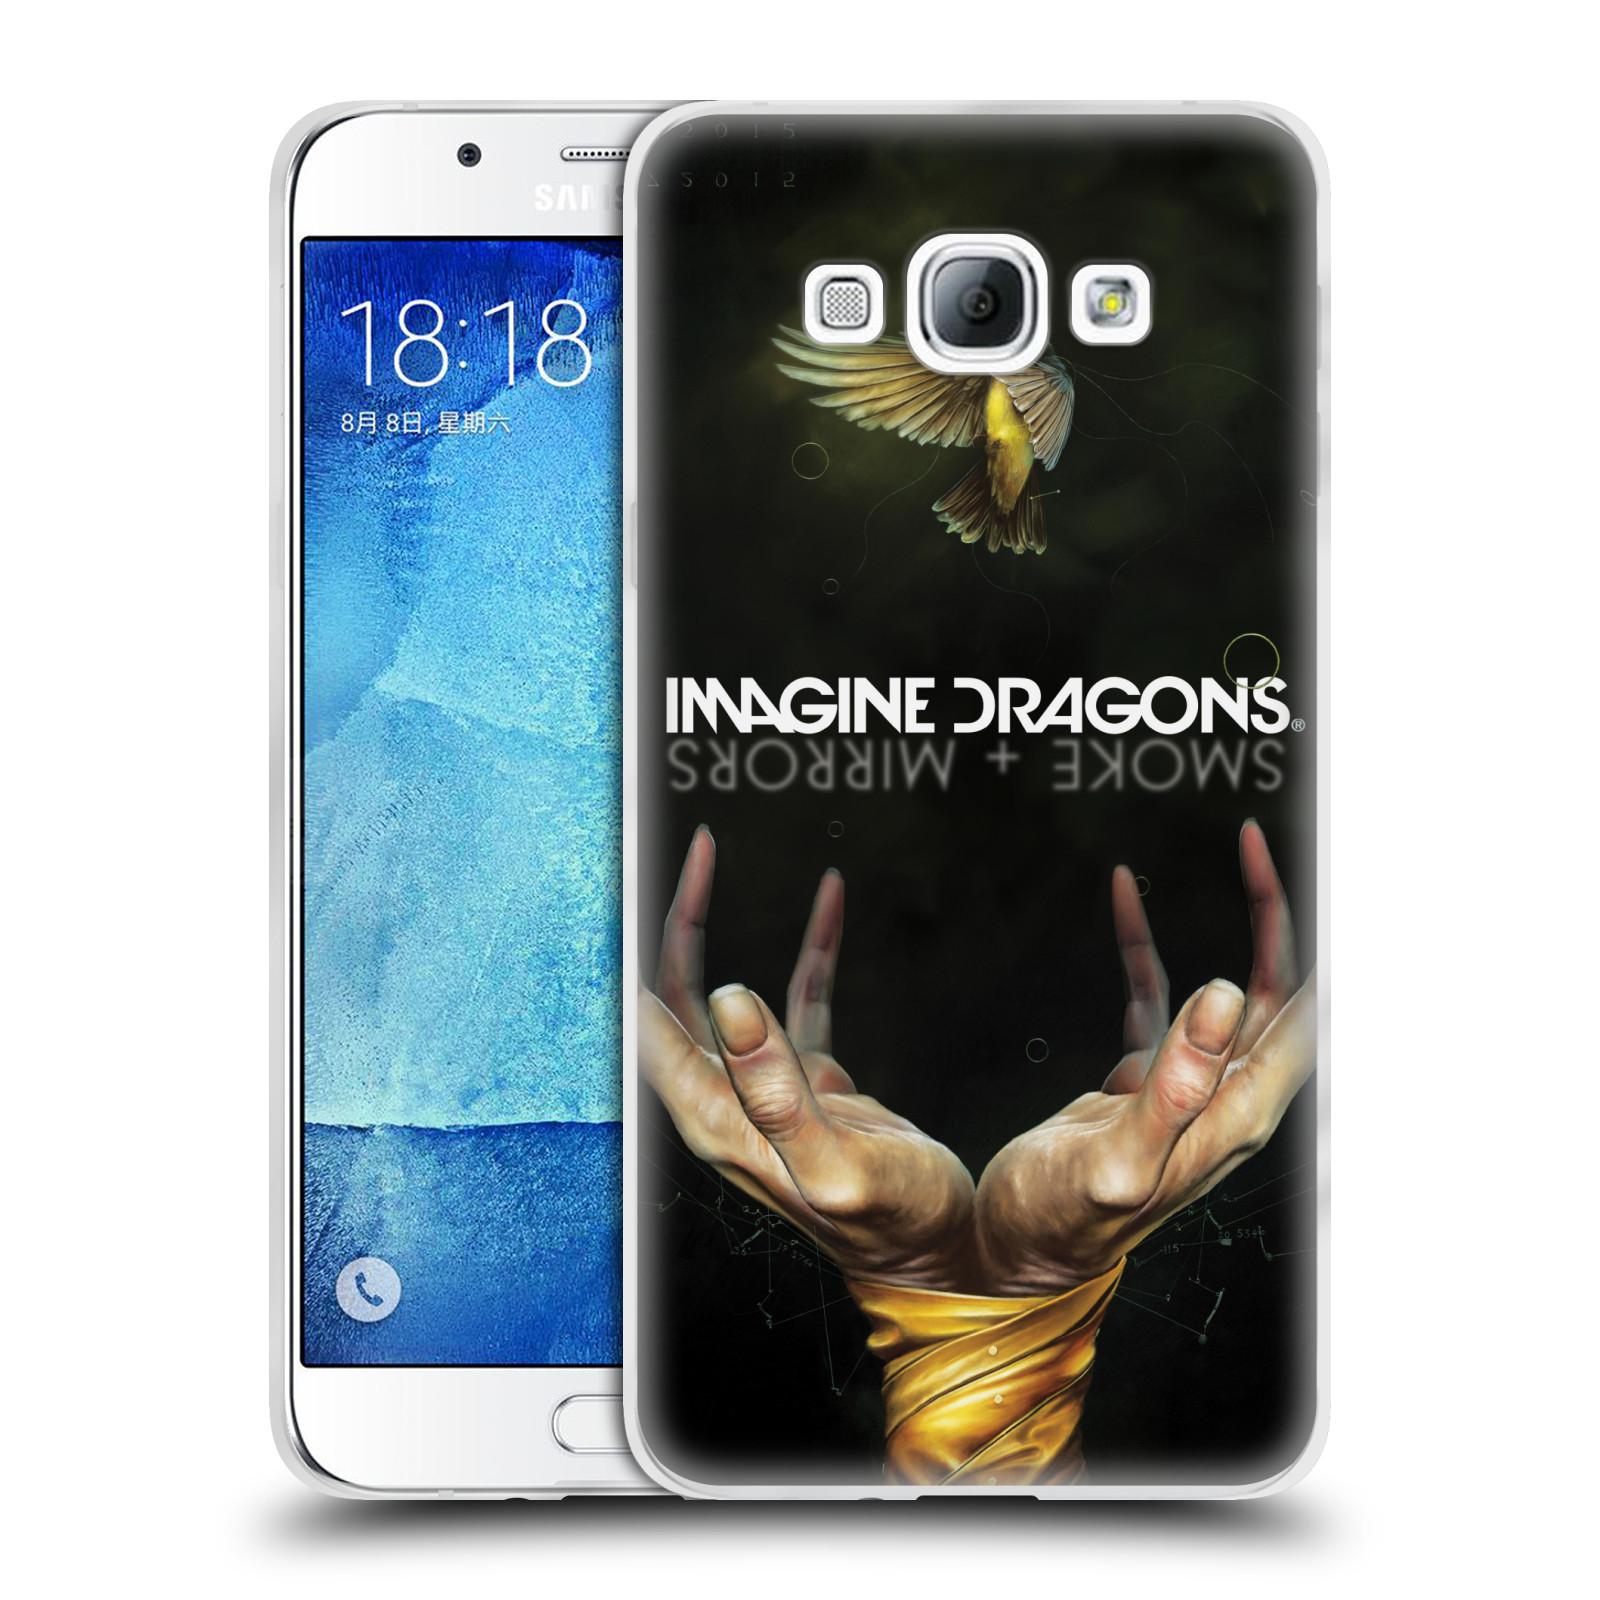 HEAD CASE silikonový obal na mobil Samsung Galaxy A8 2015 hudební skupina Imagine Dragons SMOKE and MIRRORS